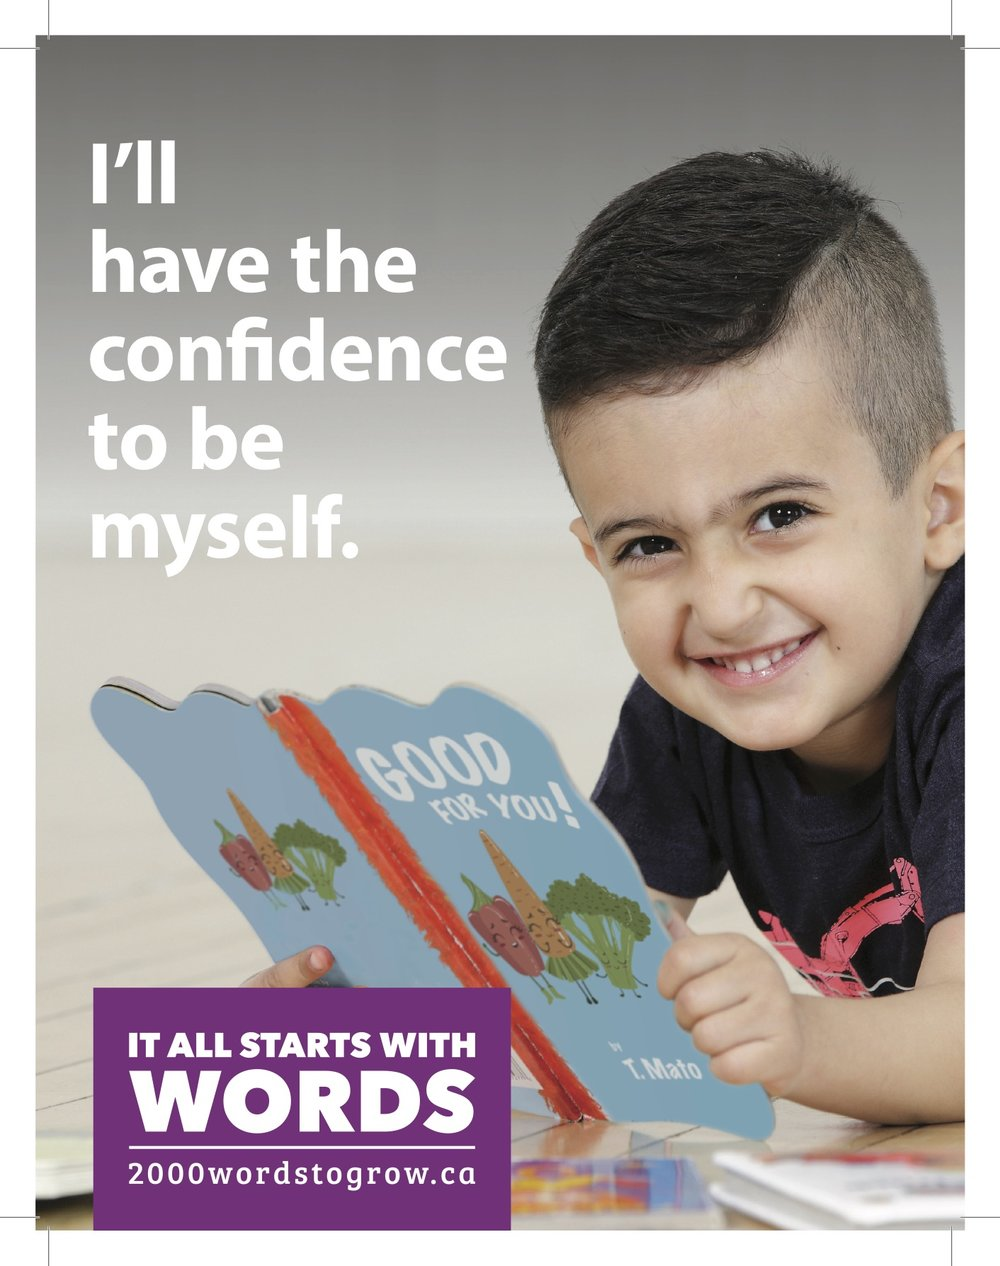 ConfidenceToBeMyself_Poster_8.5x11_PRINT.jpg